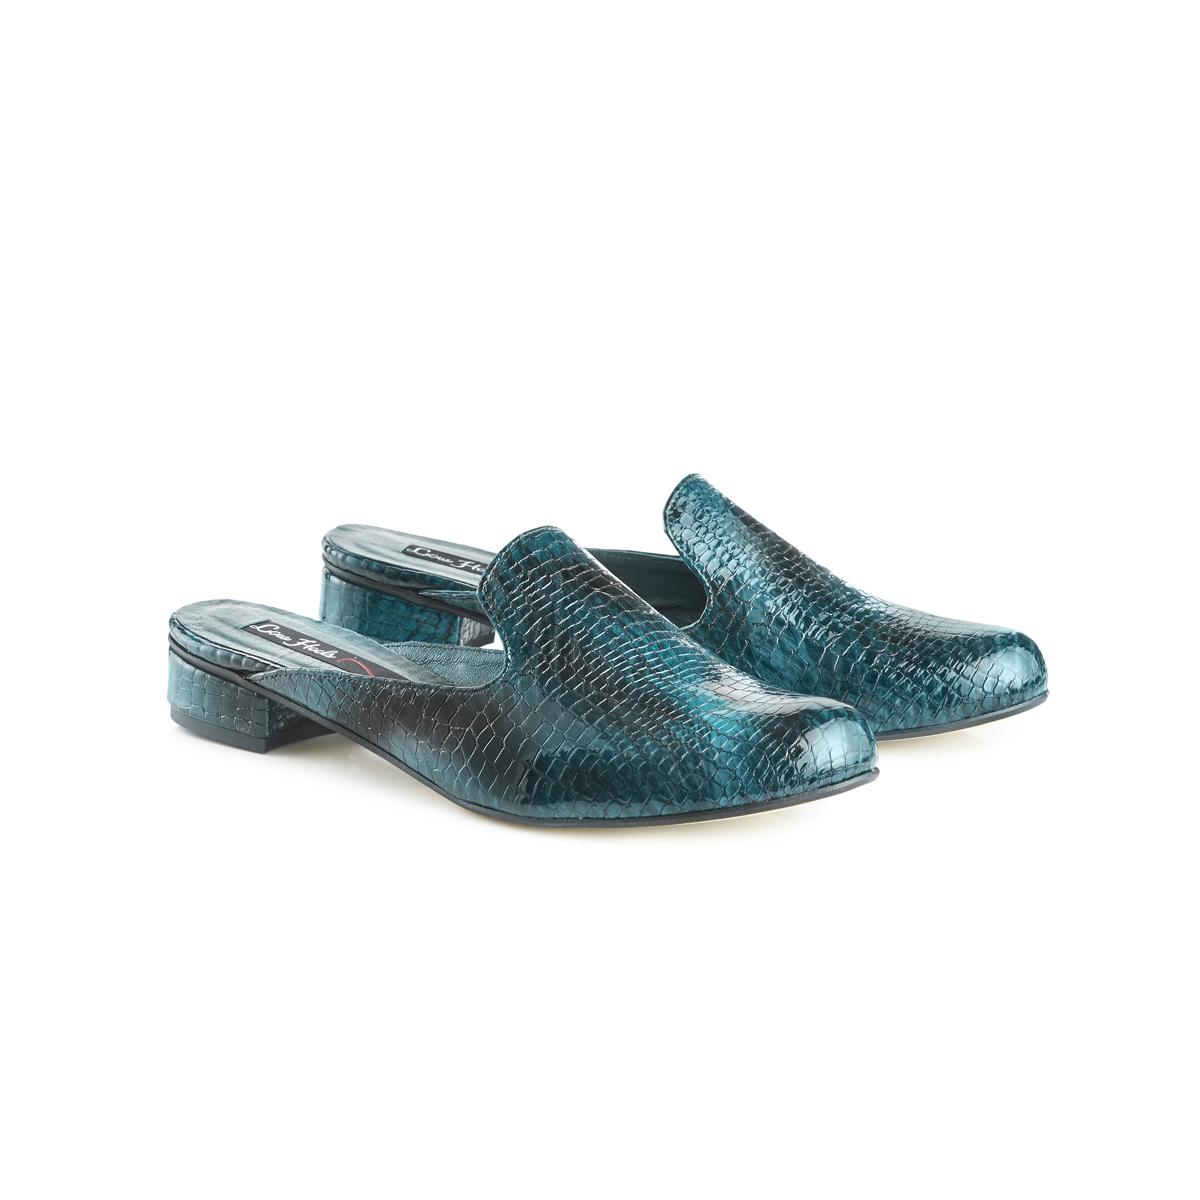 Charlie croc leather flat slip-on mules - teal